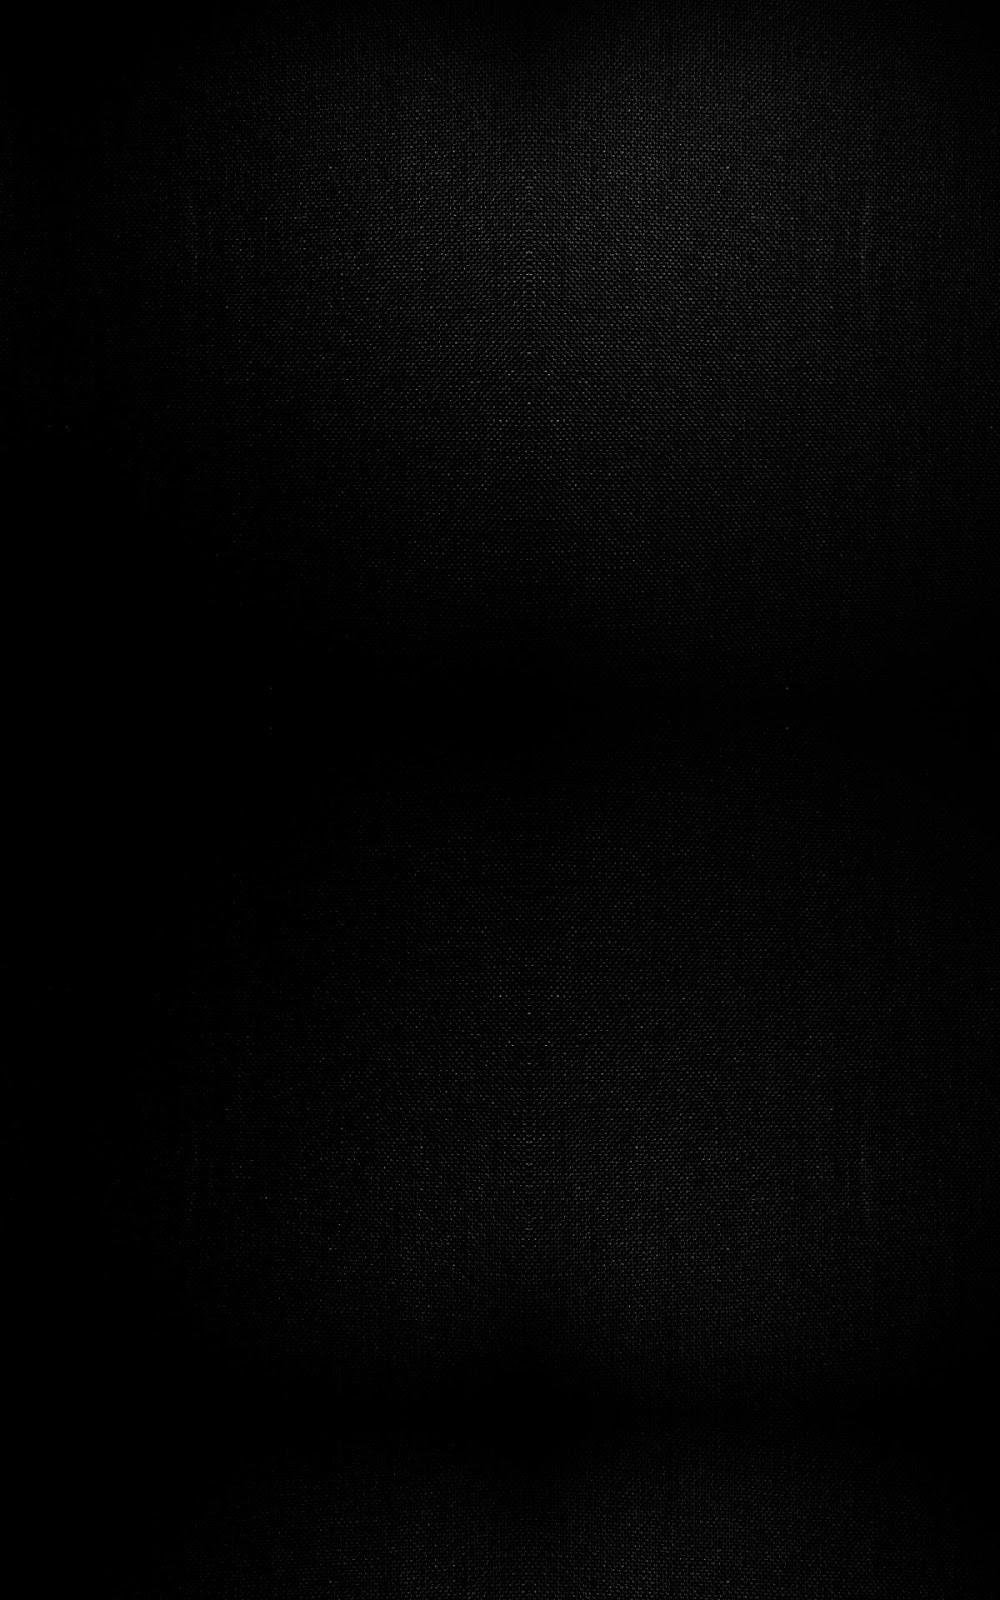 black background iphone wallpaper